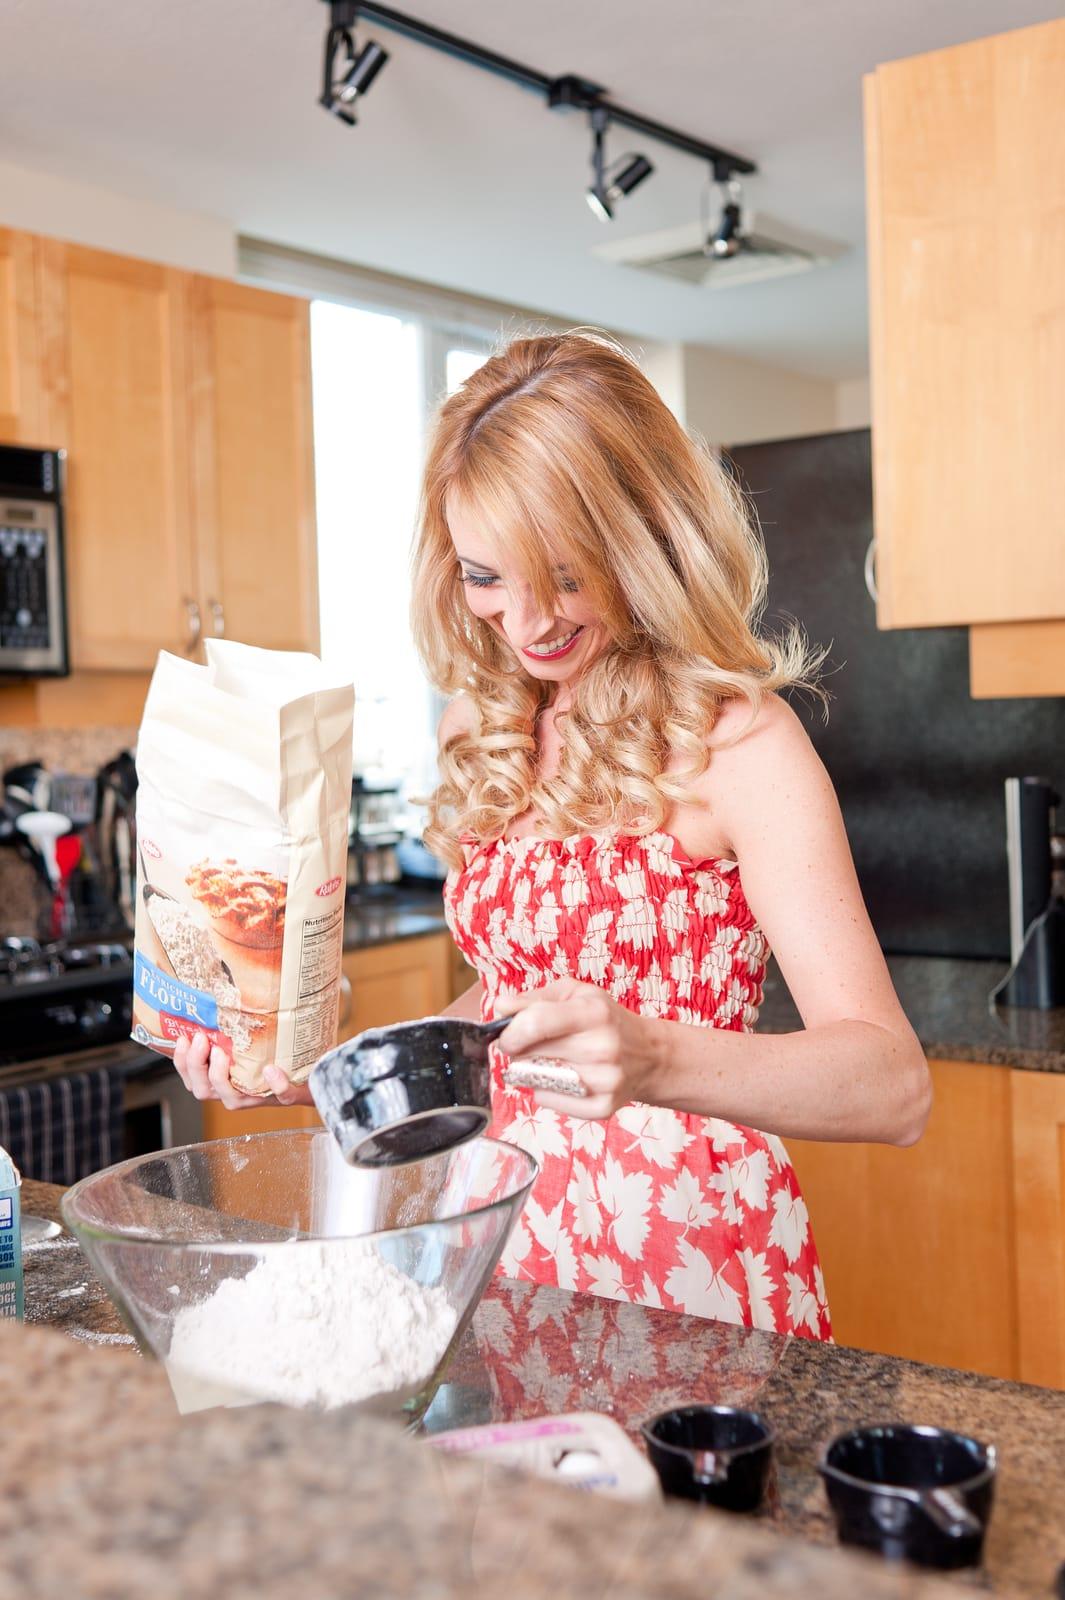 Pretty Girl Baking, Girl Baking In Kitchen, Girls Baking, Photo Shoot,  Whitney